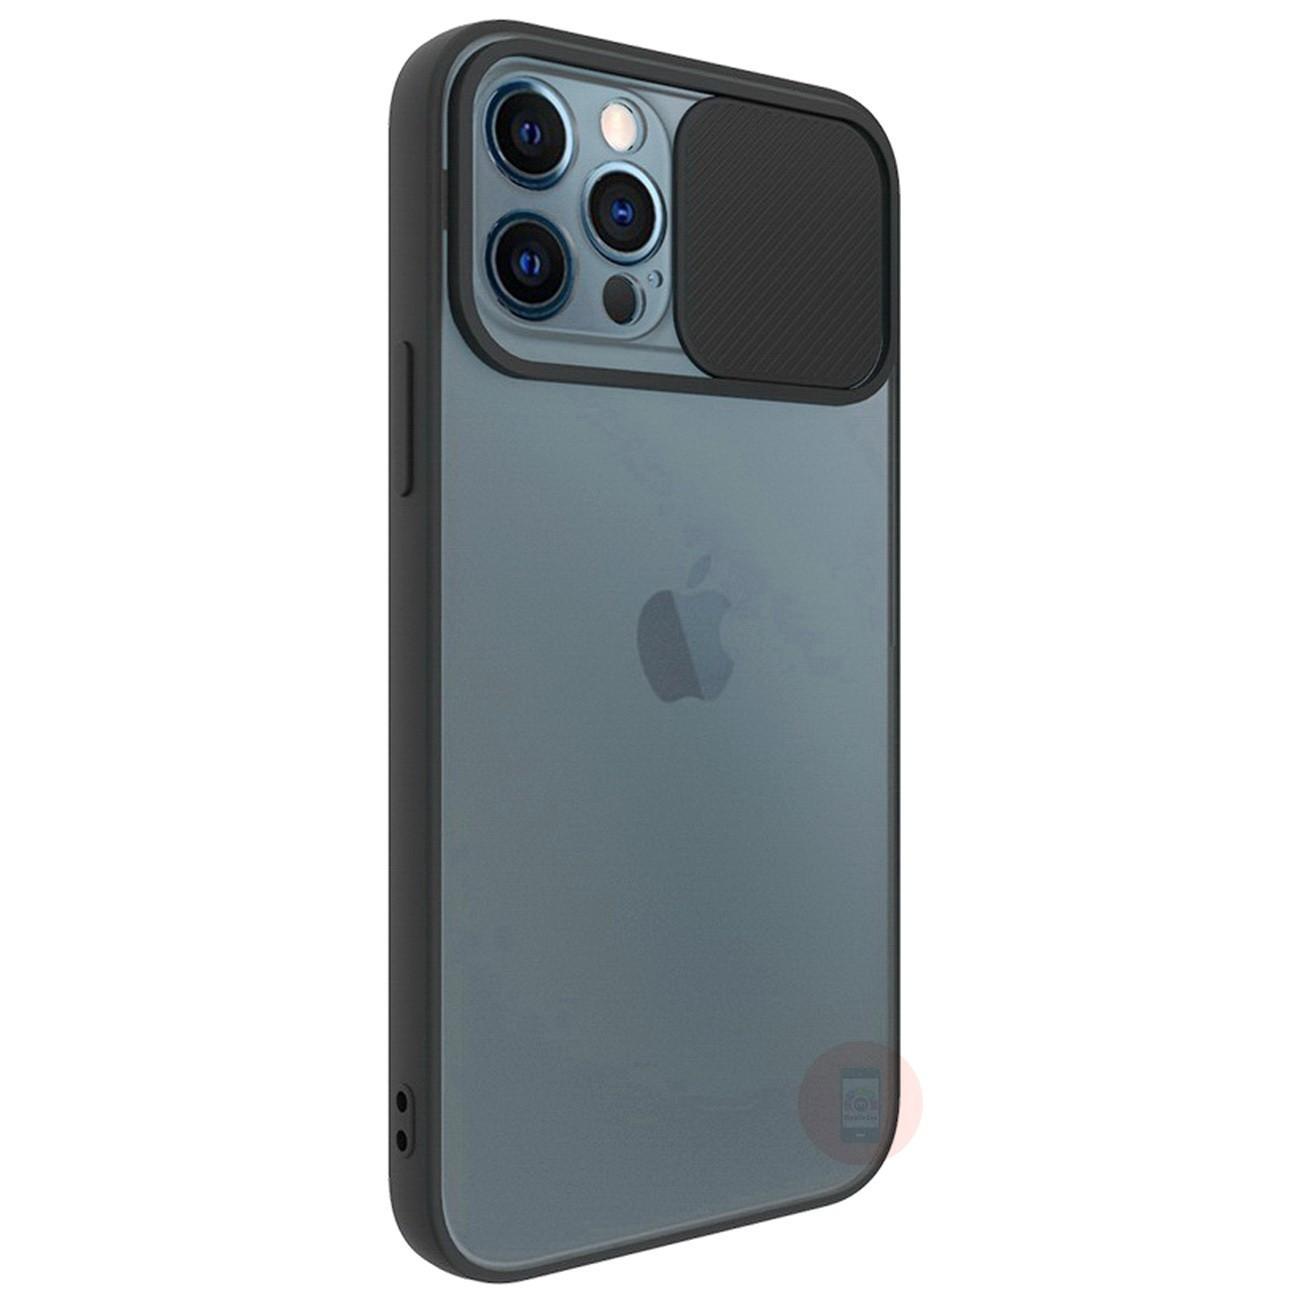 iPhone 12 Pro Max Camera Shutter Slide Smoke Back Case Cover